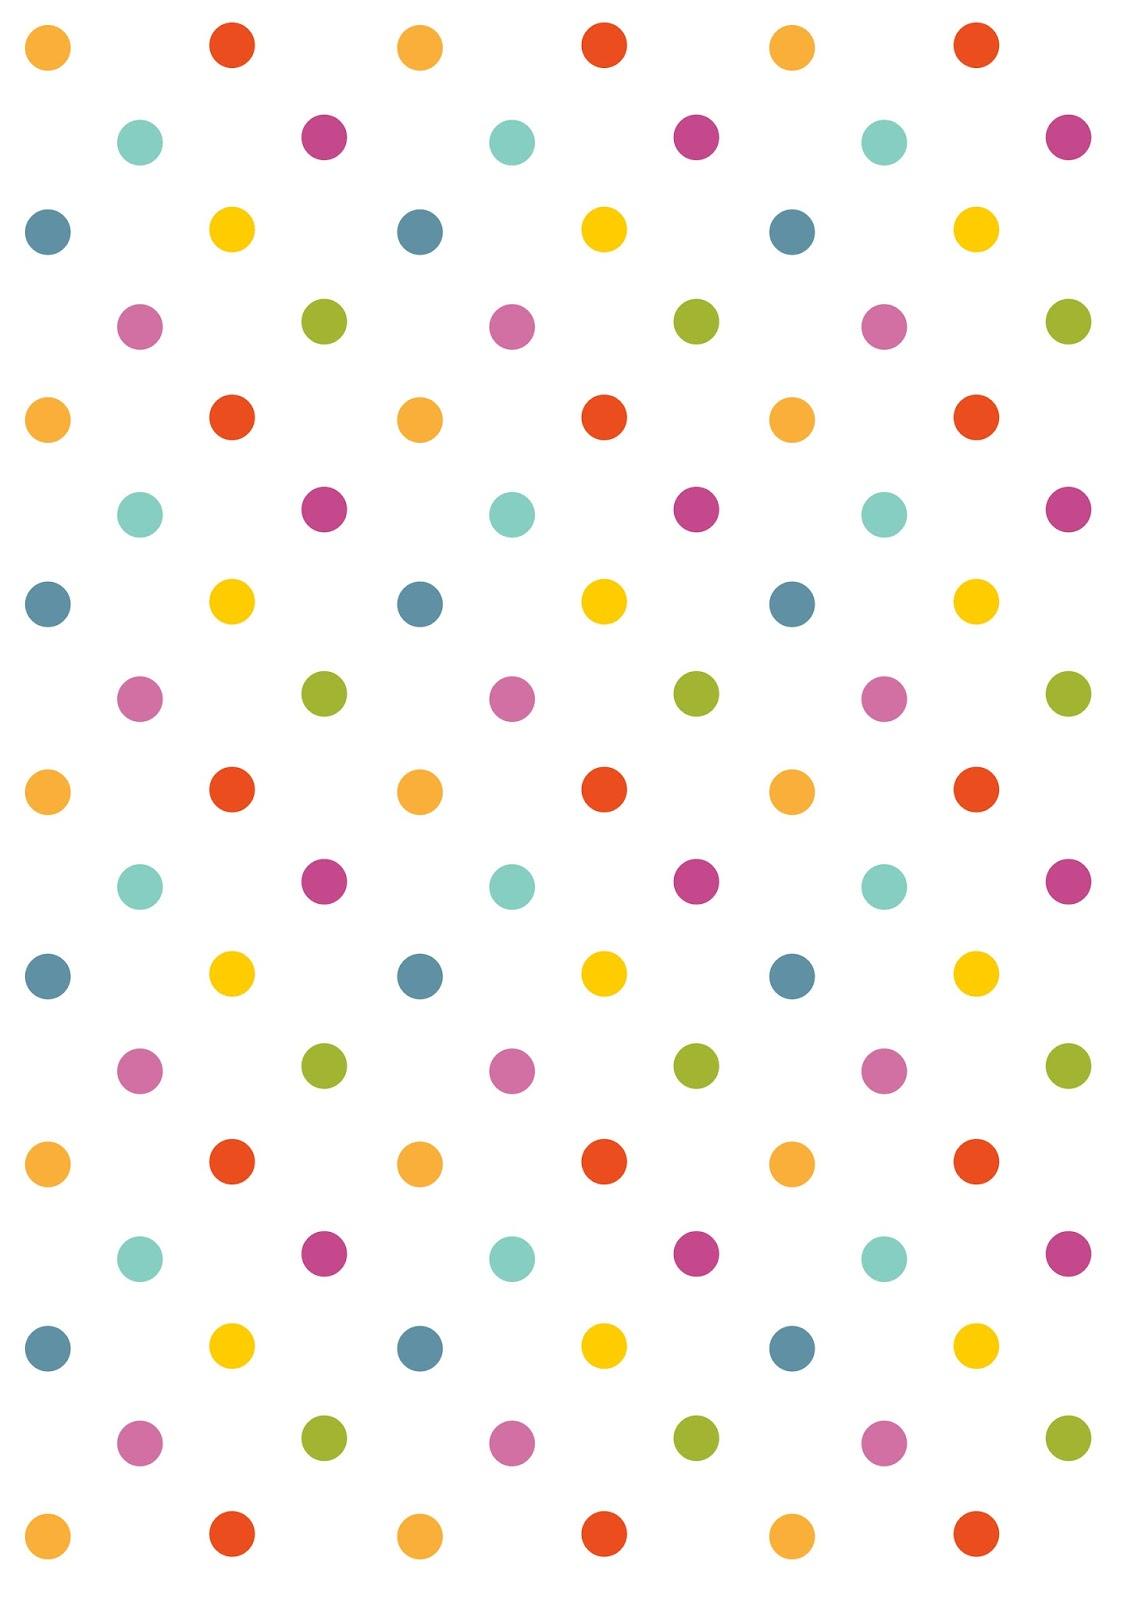 Free Digital Polka Dot Scrapbooking Paper